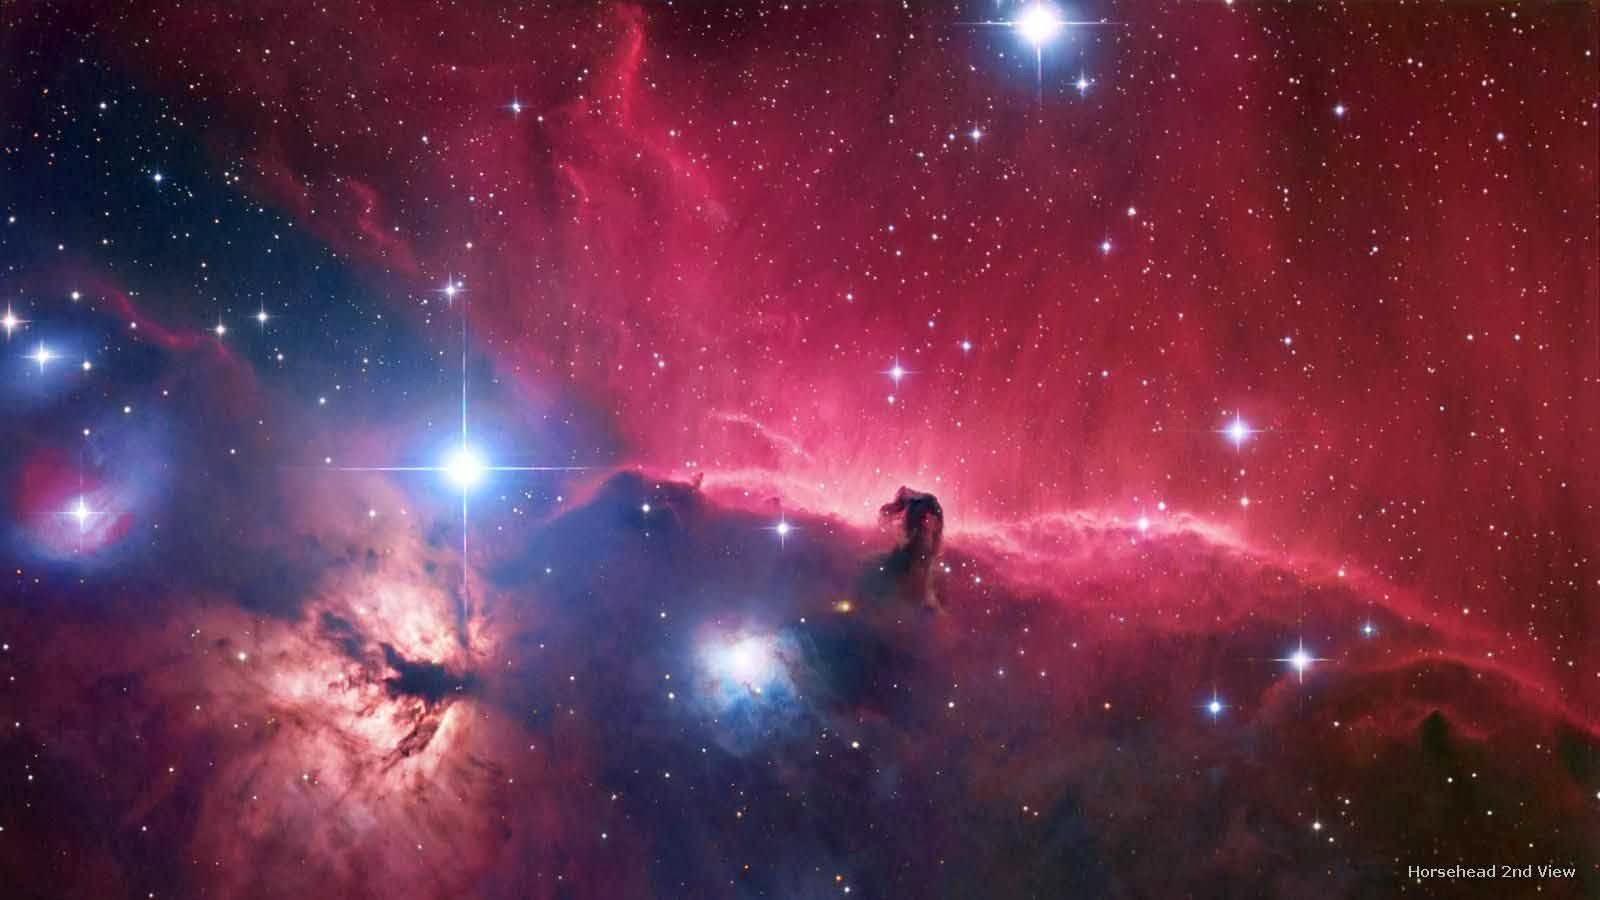 HD Wallpapers Horsehead Nebula Wallpapers 1600x900